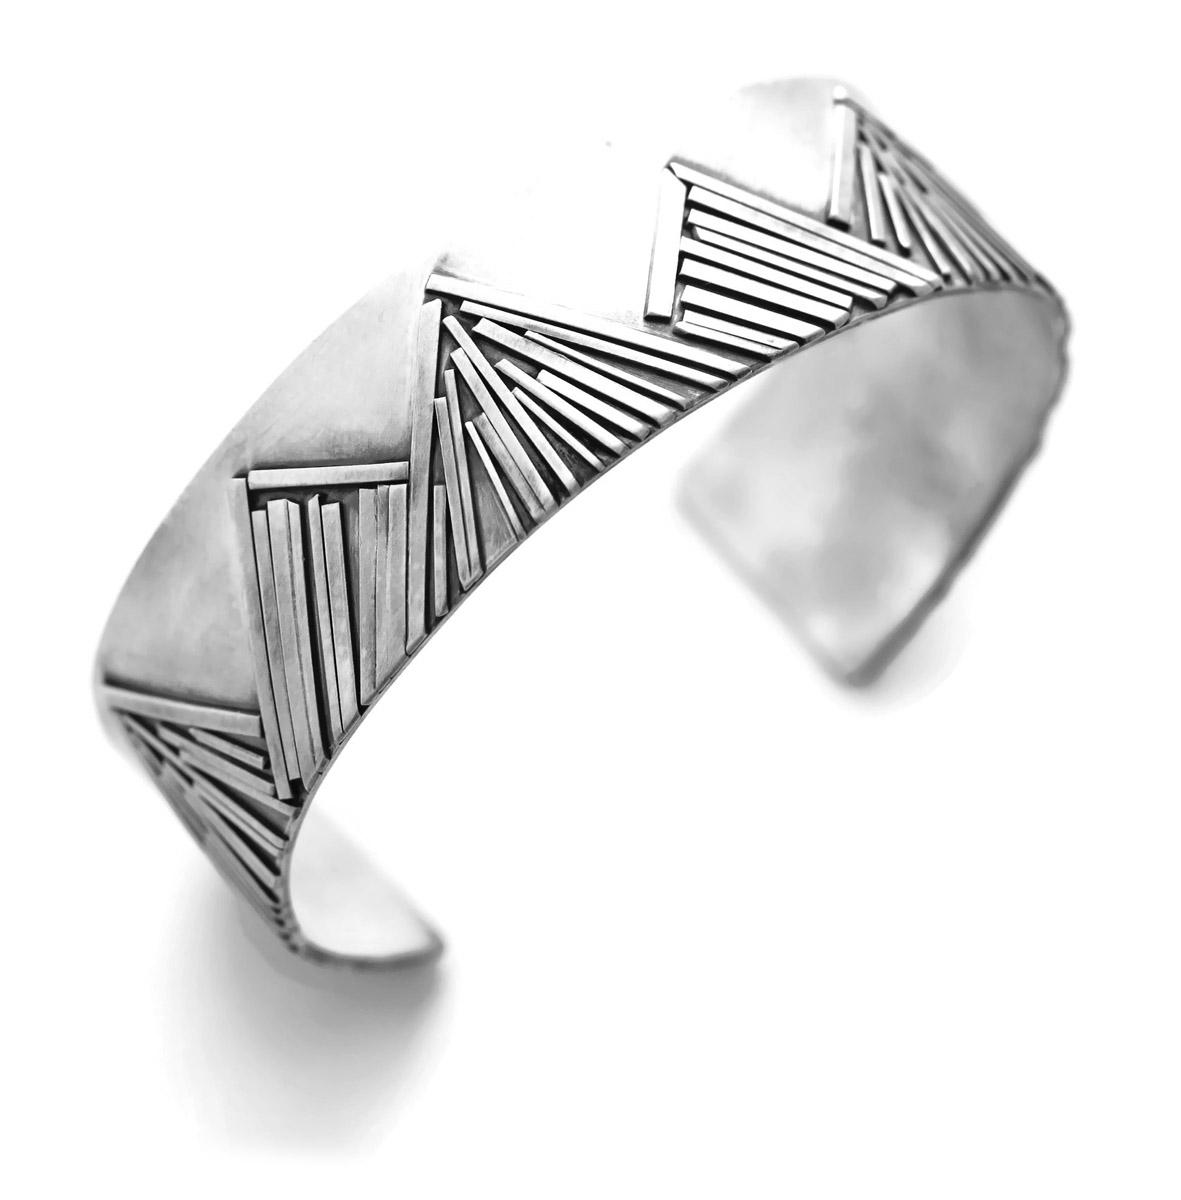 Mountain Range Cuff Bracelet - Angled